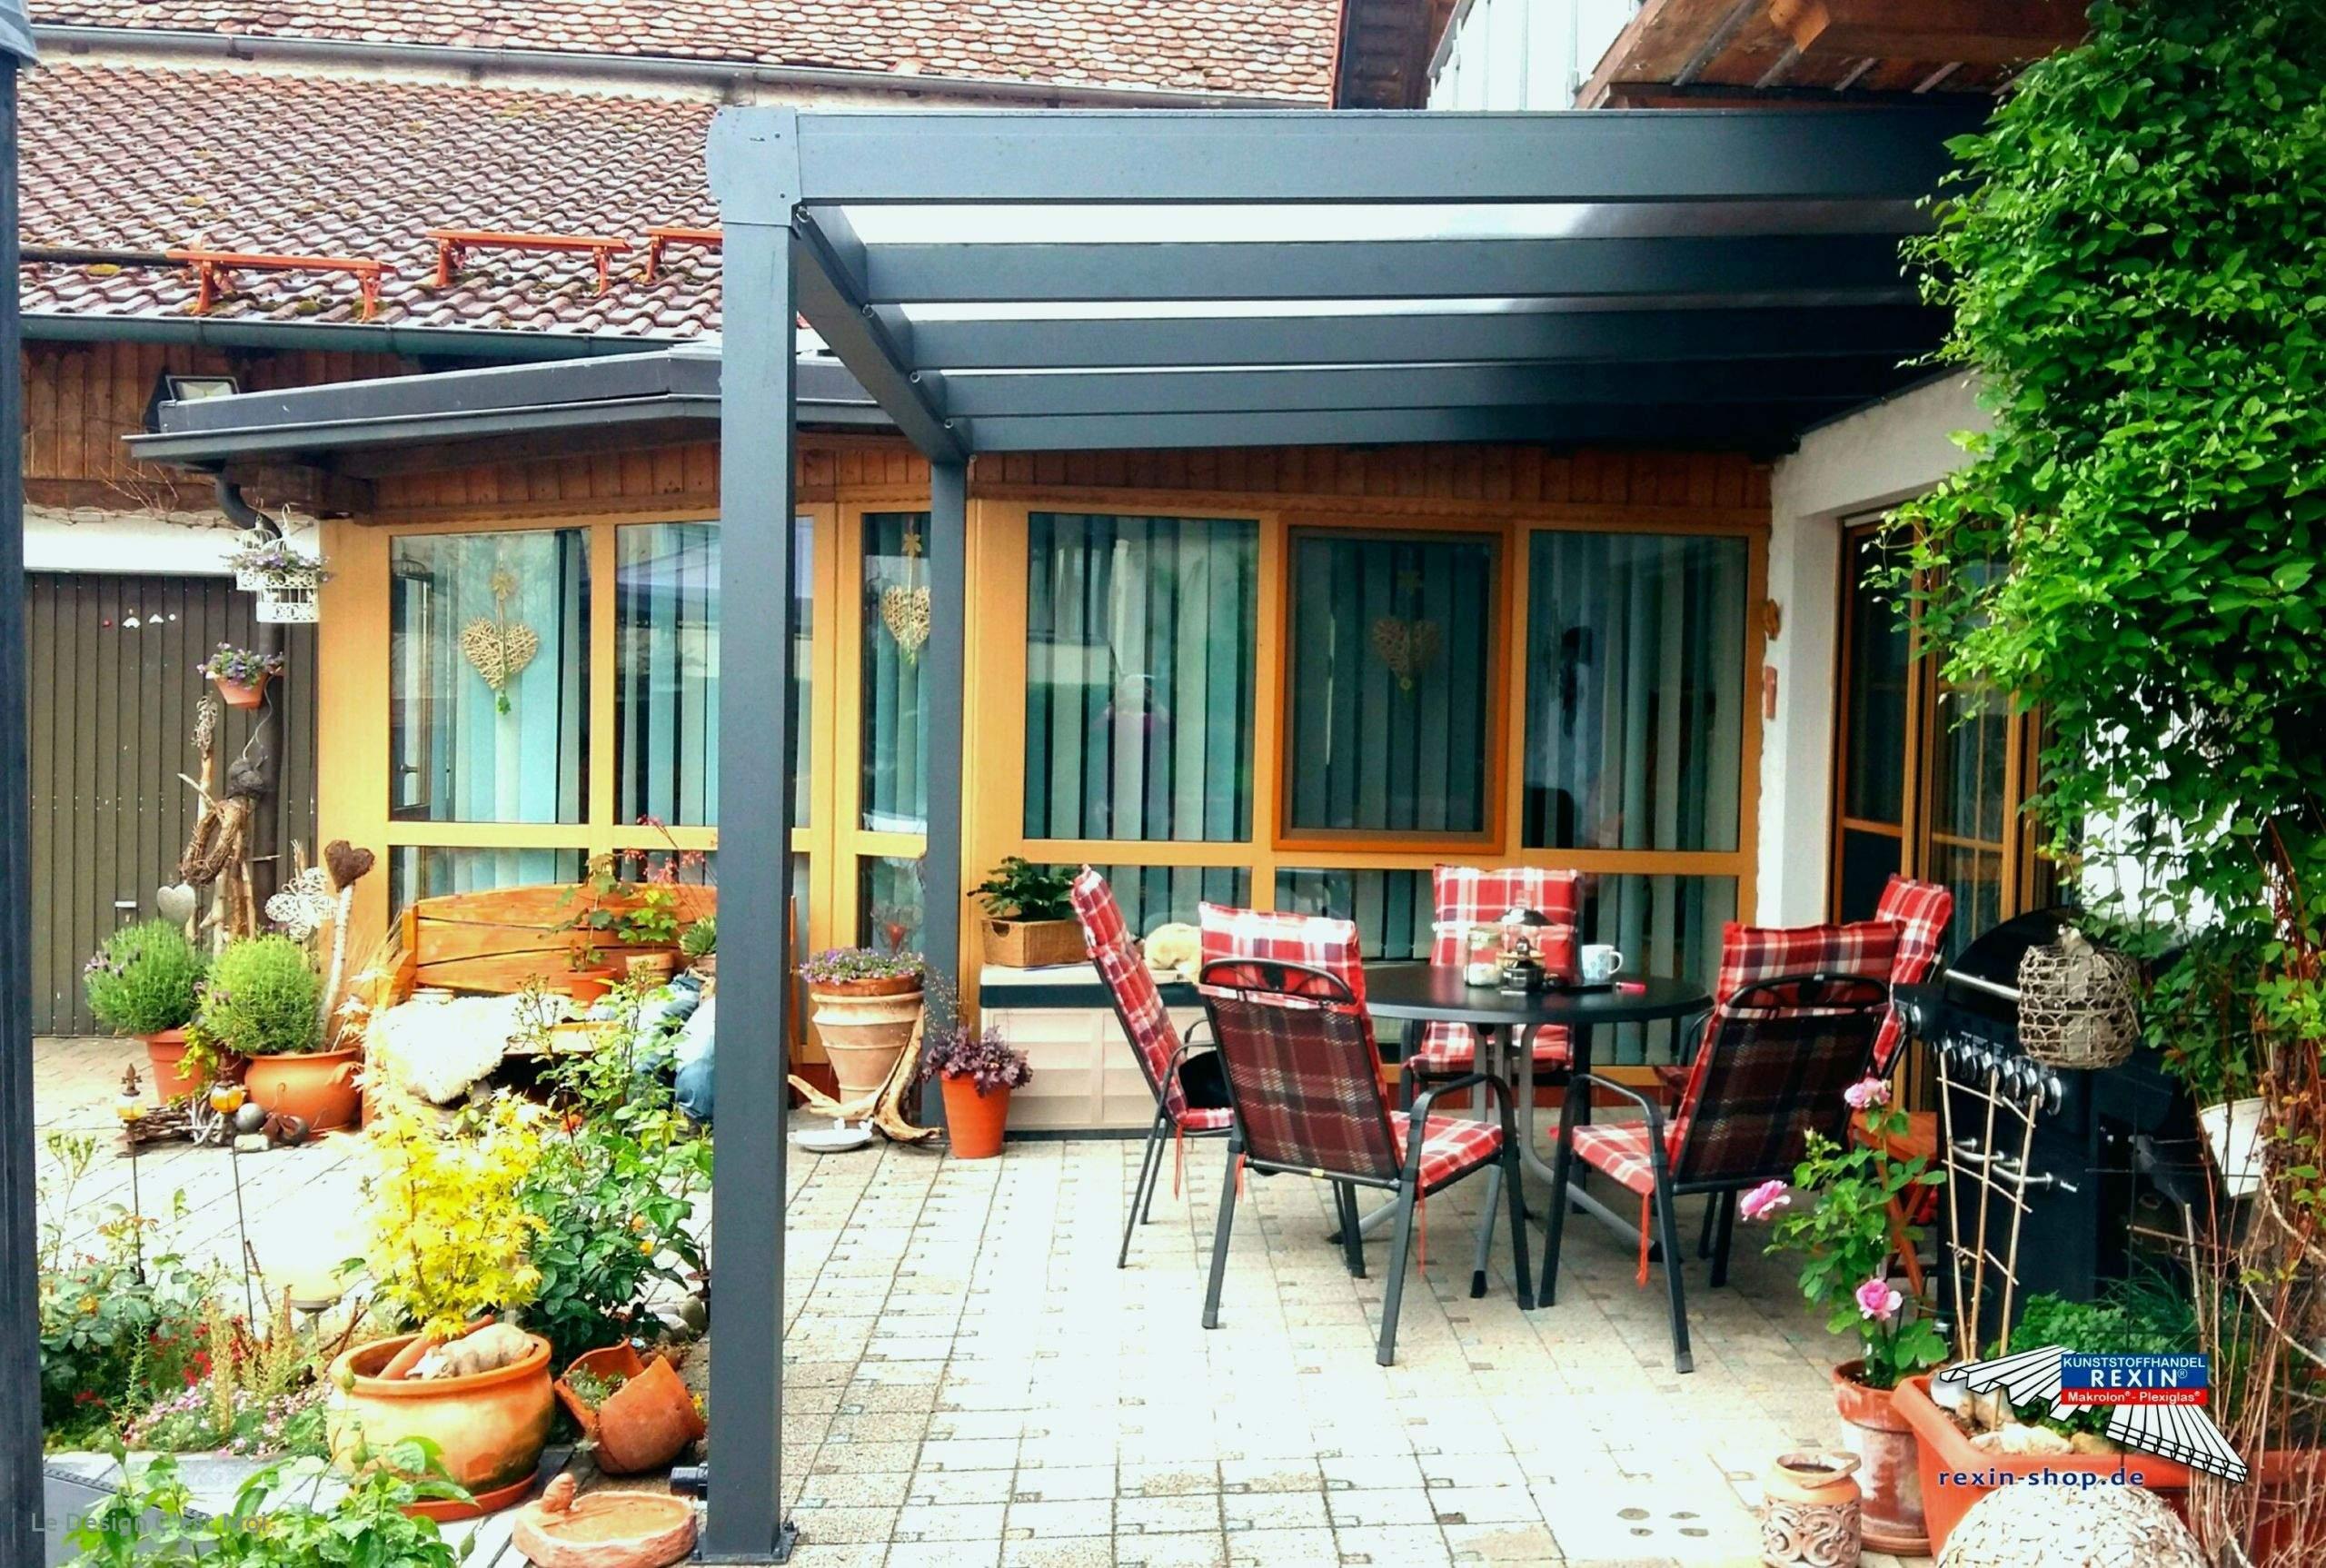 Serre De Jardin Impressionnant 28 Unique Salon De Jardin En ... tout Serre De Jardin Pas Chere